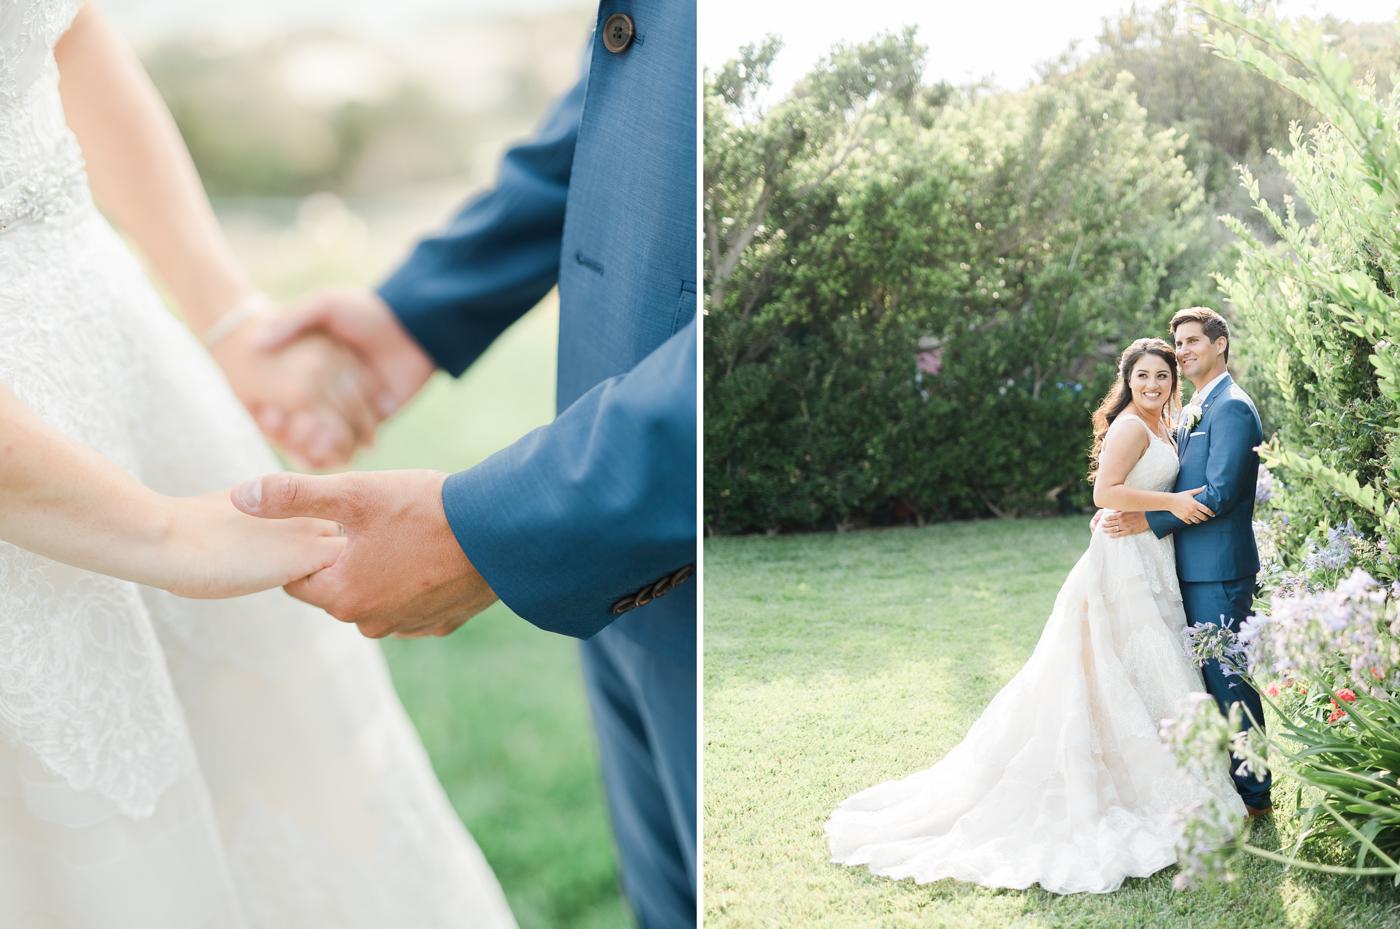 AKP_S&F_Malibu_Wedding_Fine_Art_Photography_Los_Angeles-38.jpg